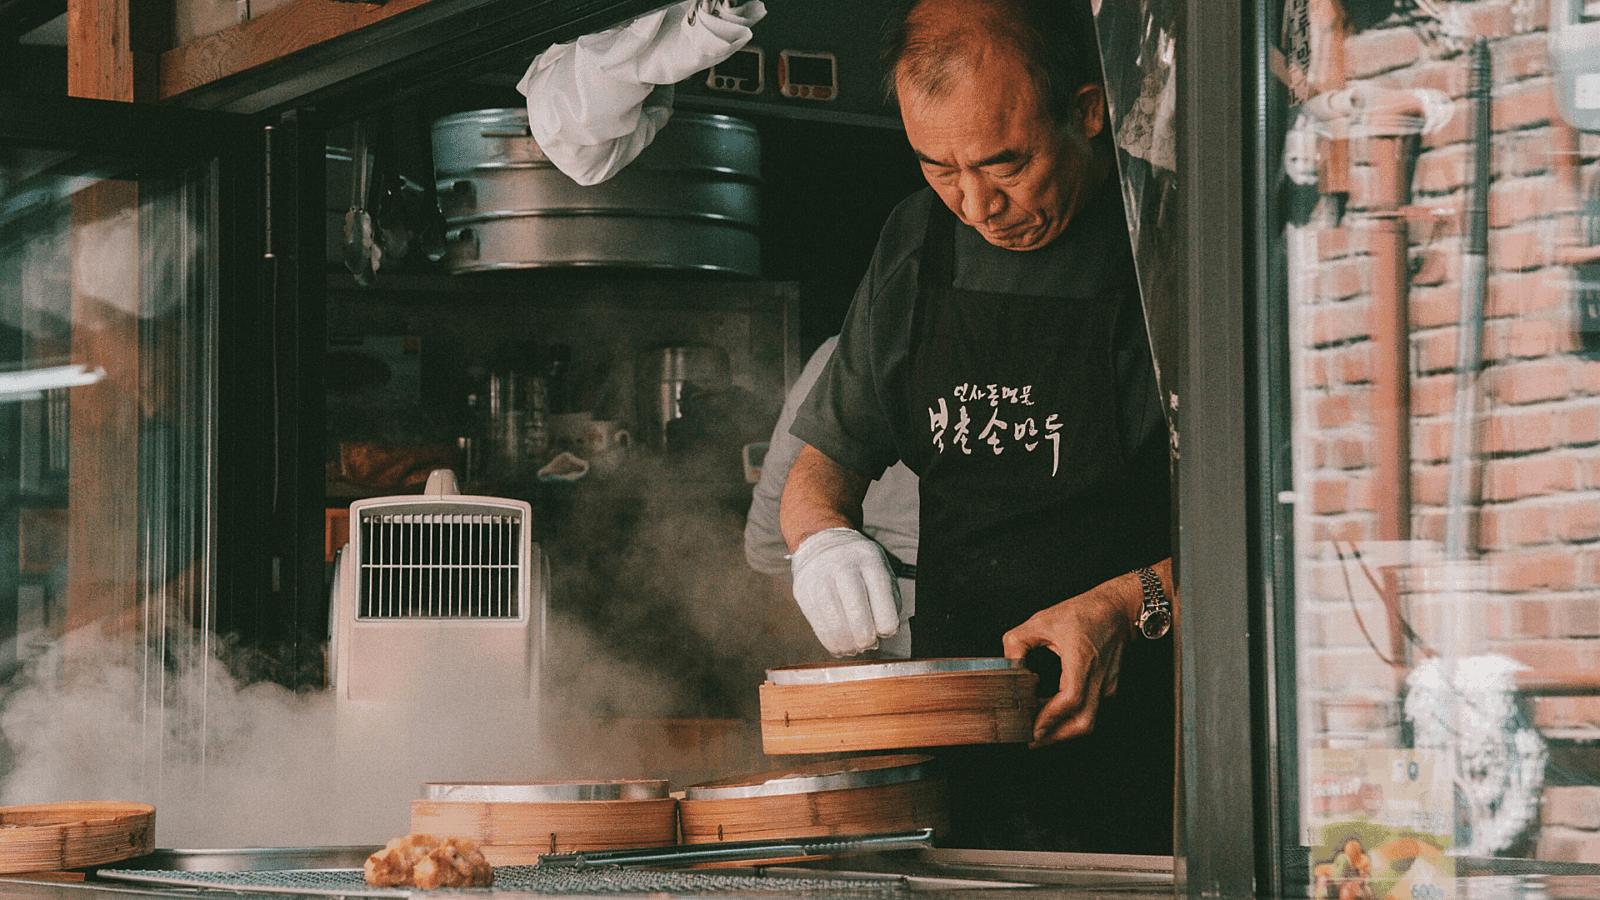 Man cooking dumplings chef